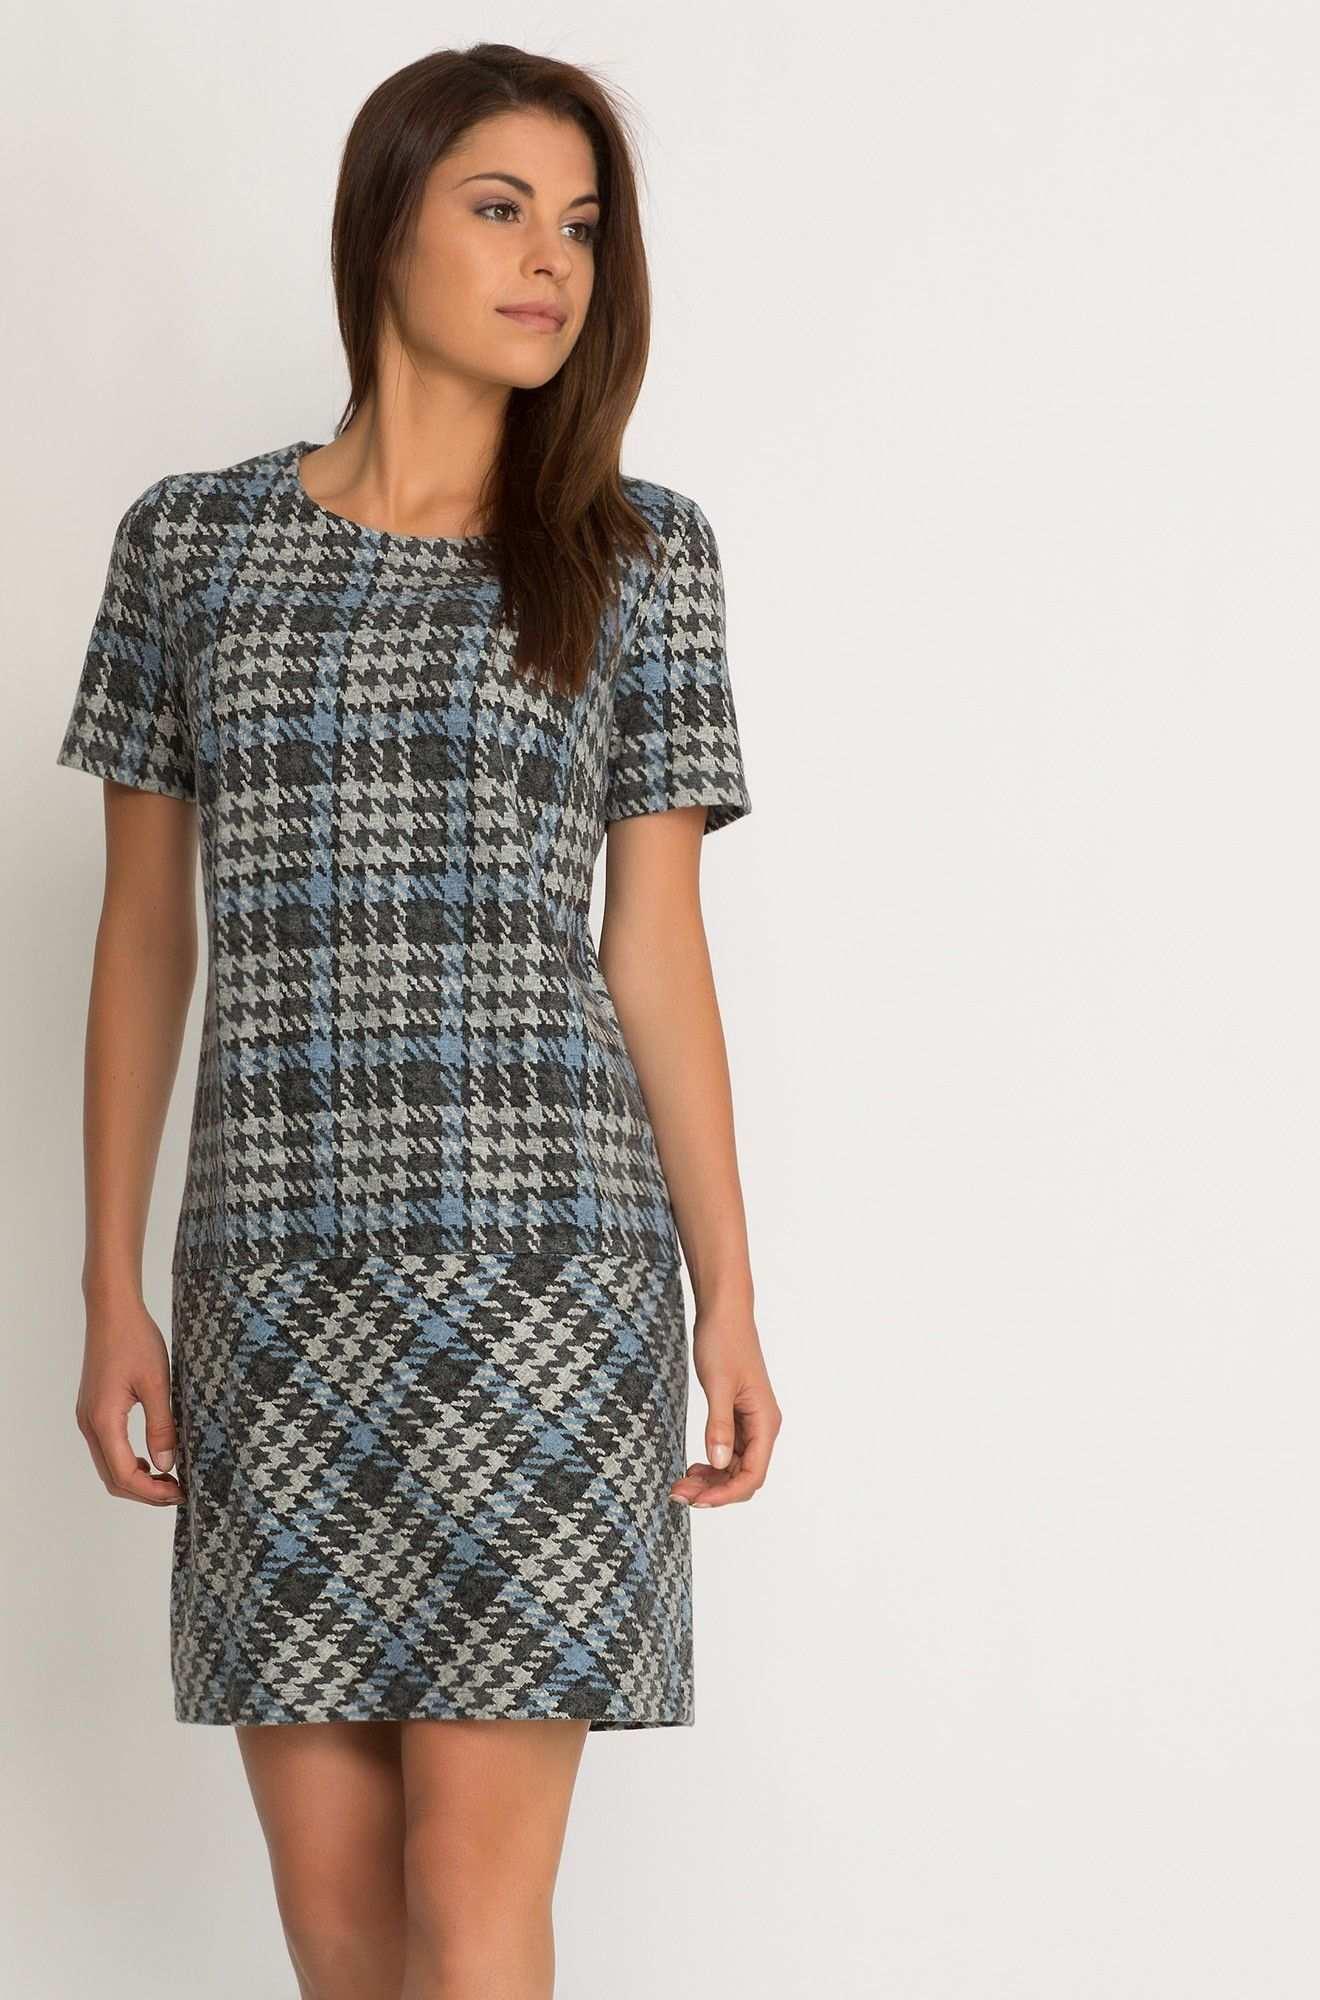 Kleid In Karo Muster Vestido Com Saia Moda Saias